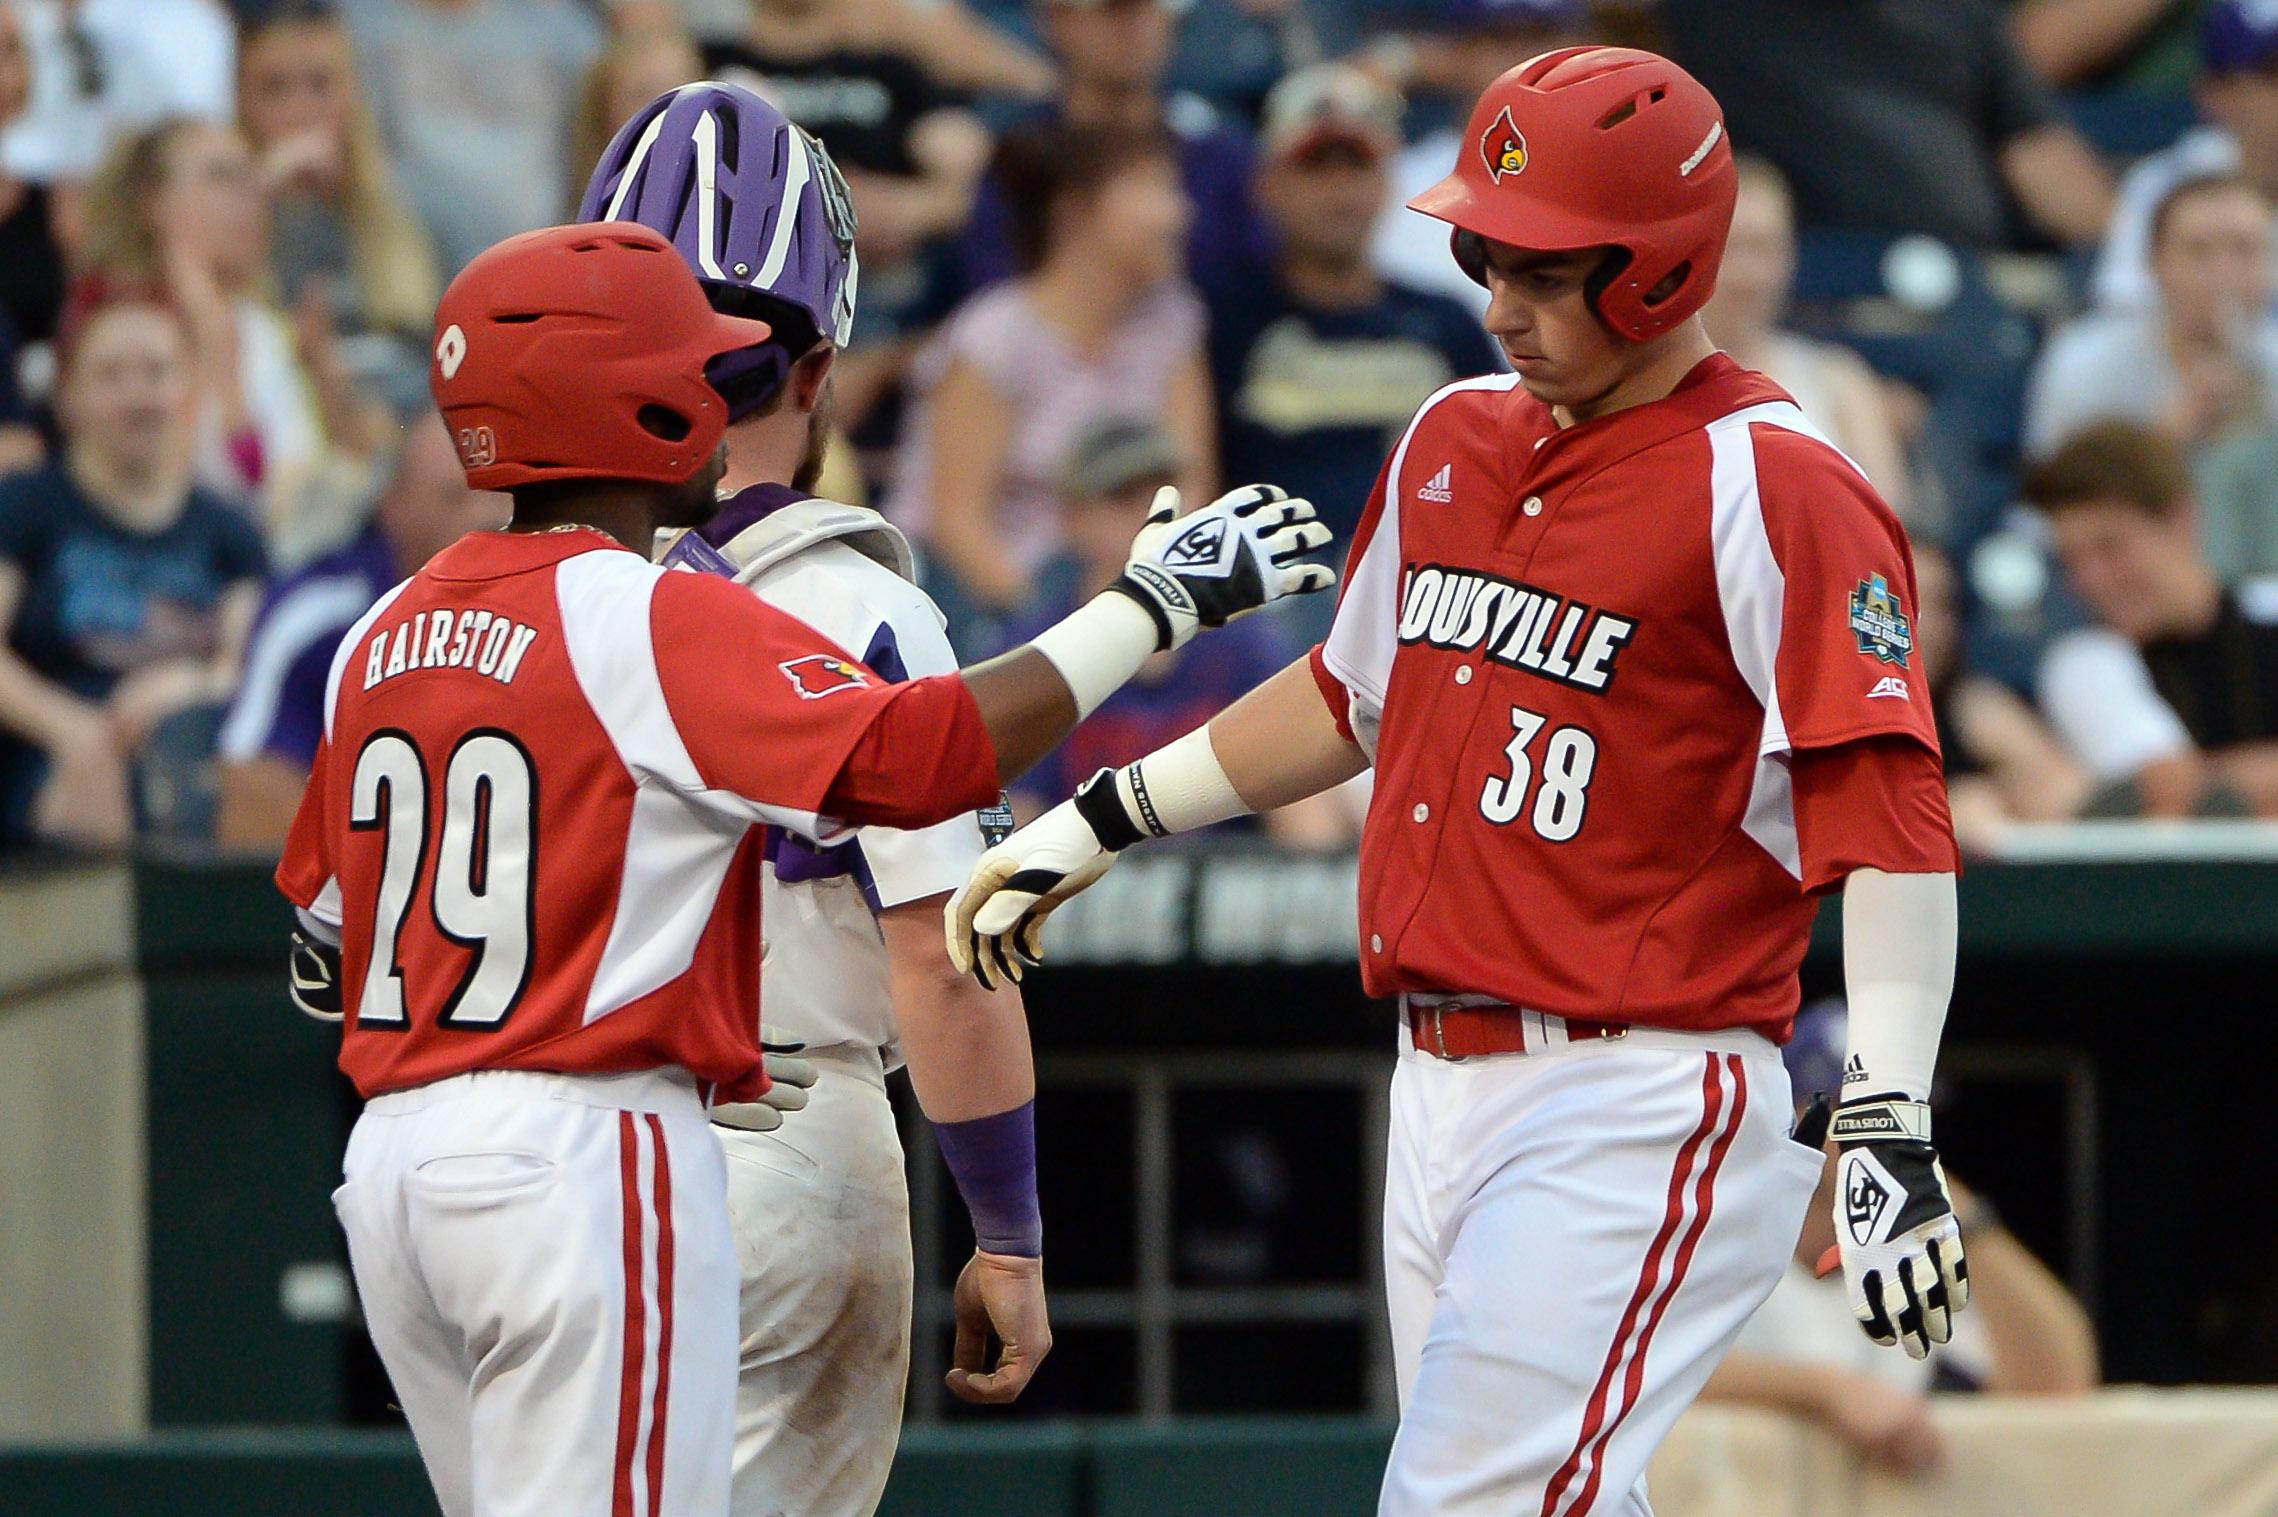 10126758-ncaa-baseball-college-world-series-louisville-vs-tcu